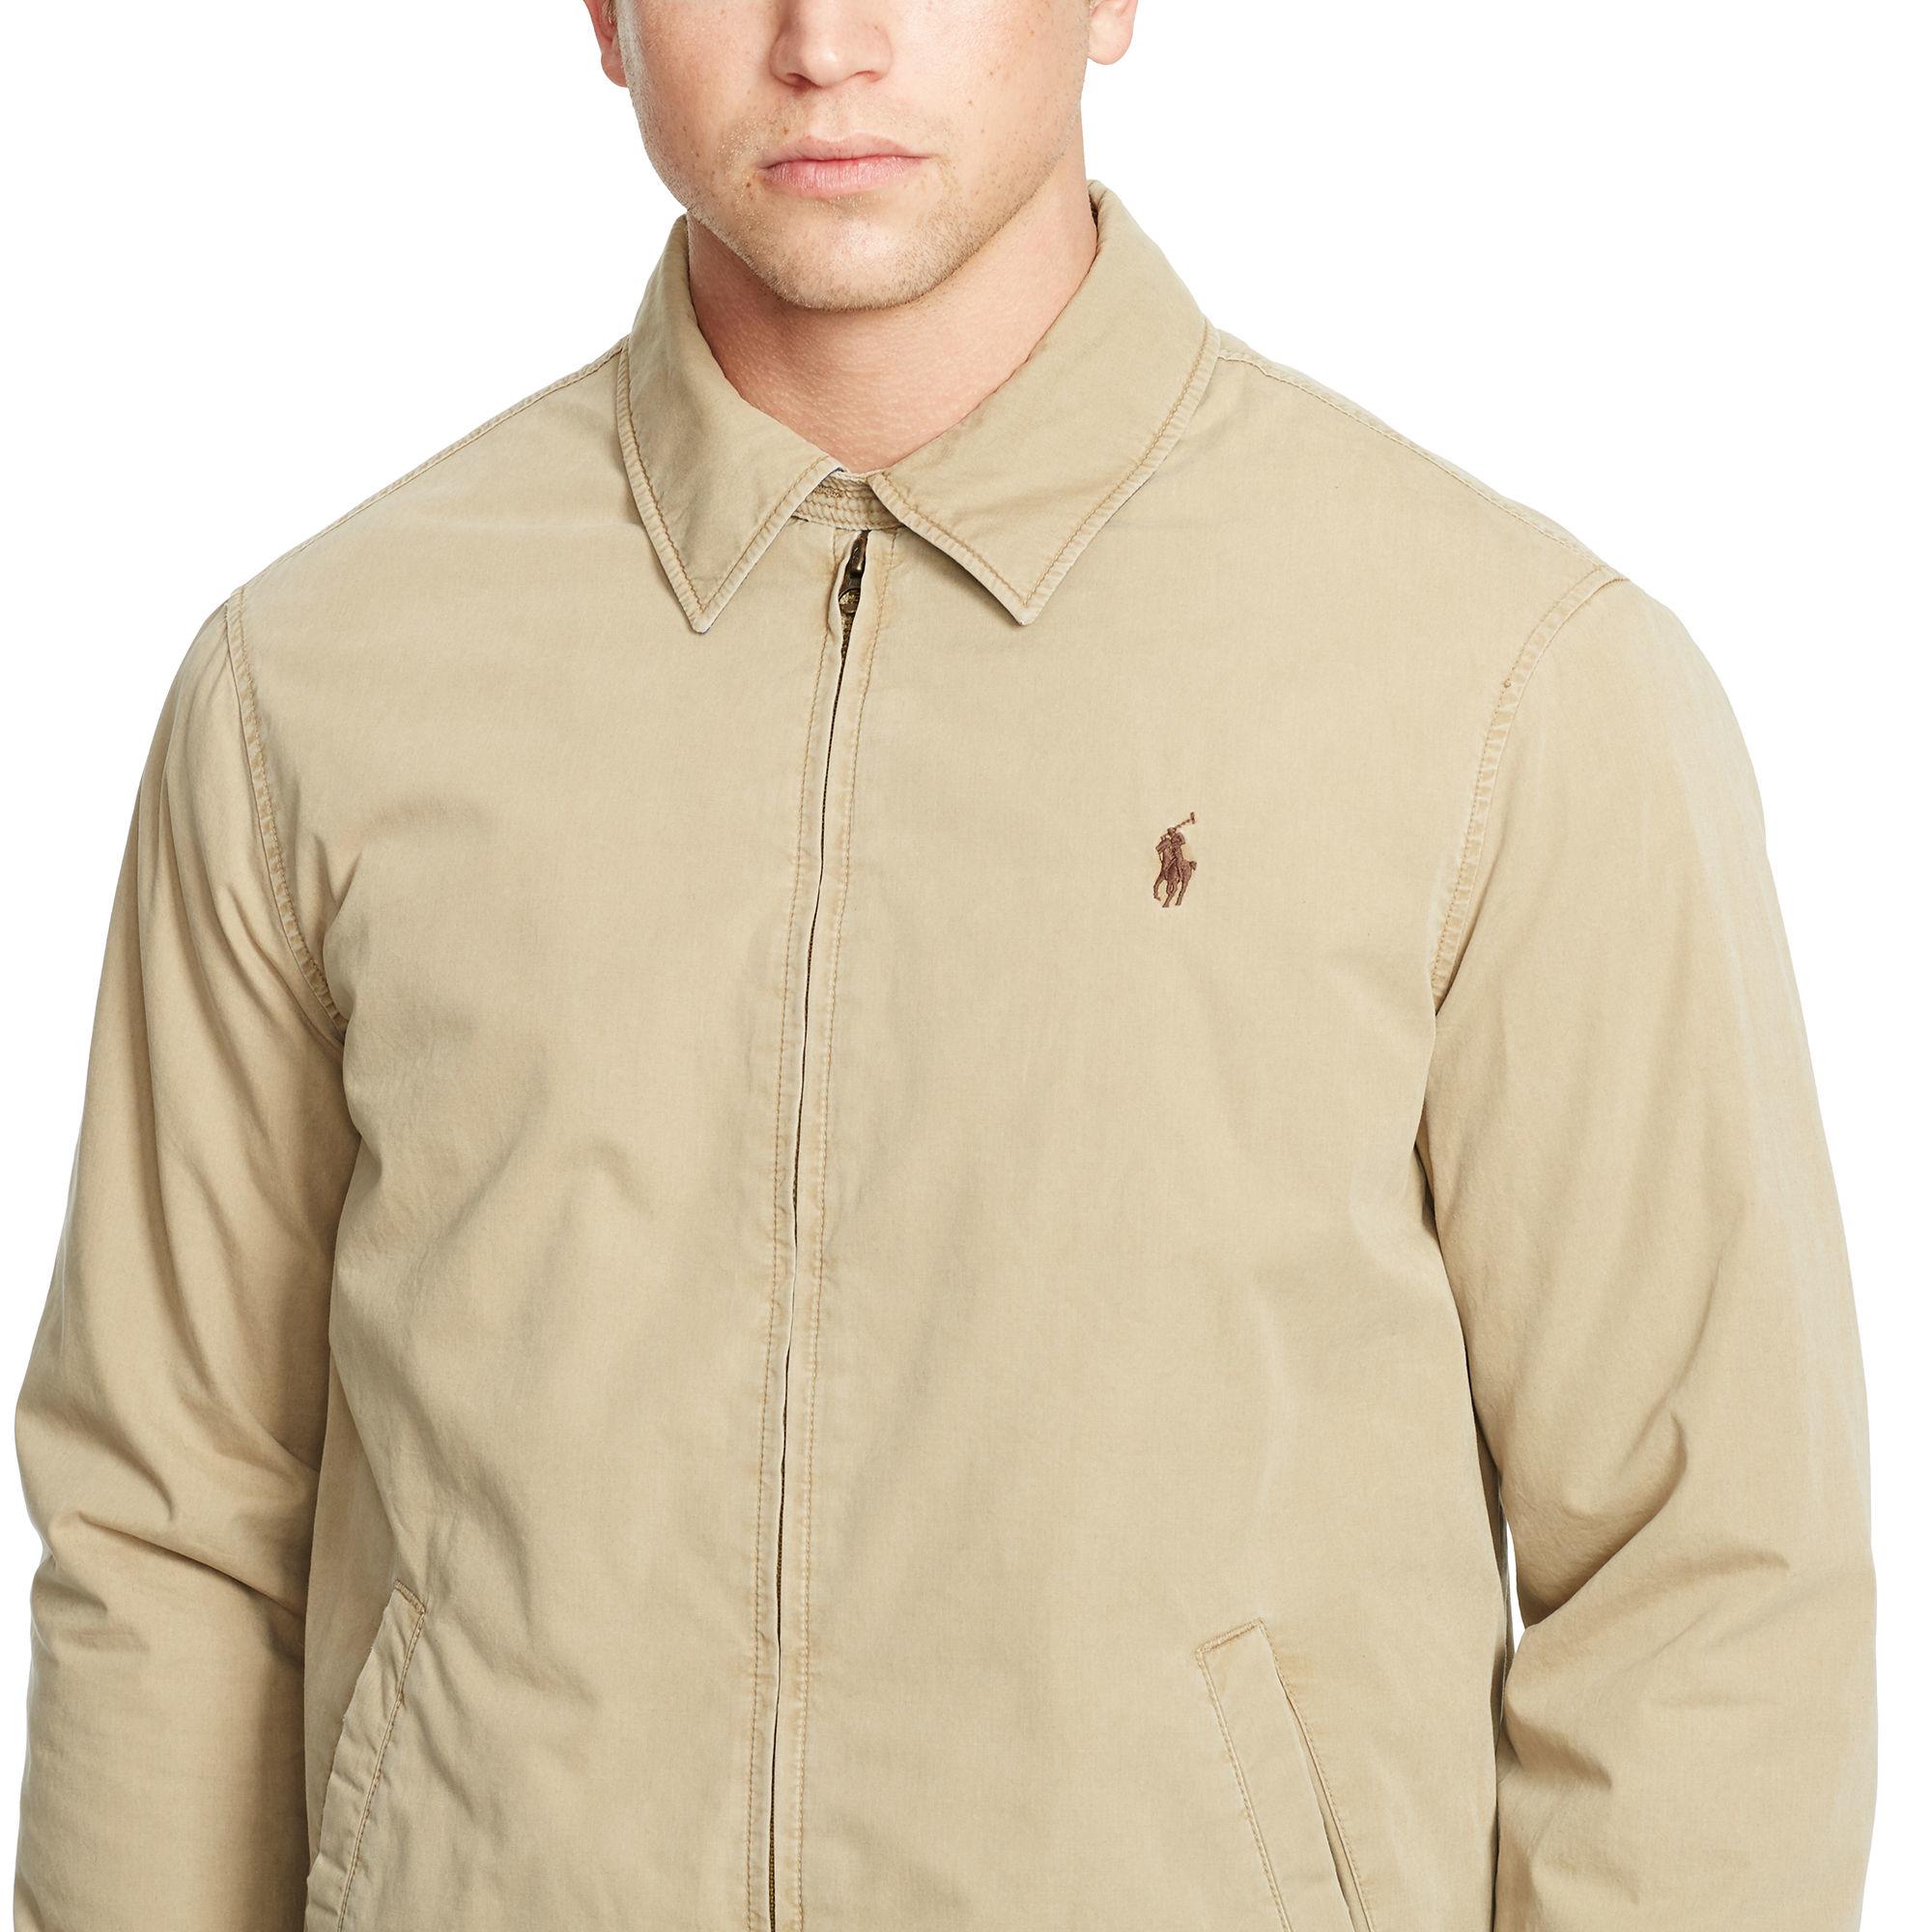 357006ef0 Polo Ralph Lauren Landon Cotton Poplin Jacket in Natural for Men - Lyst